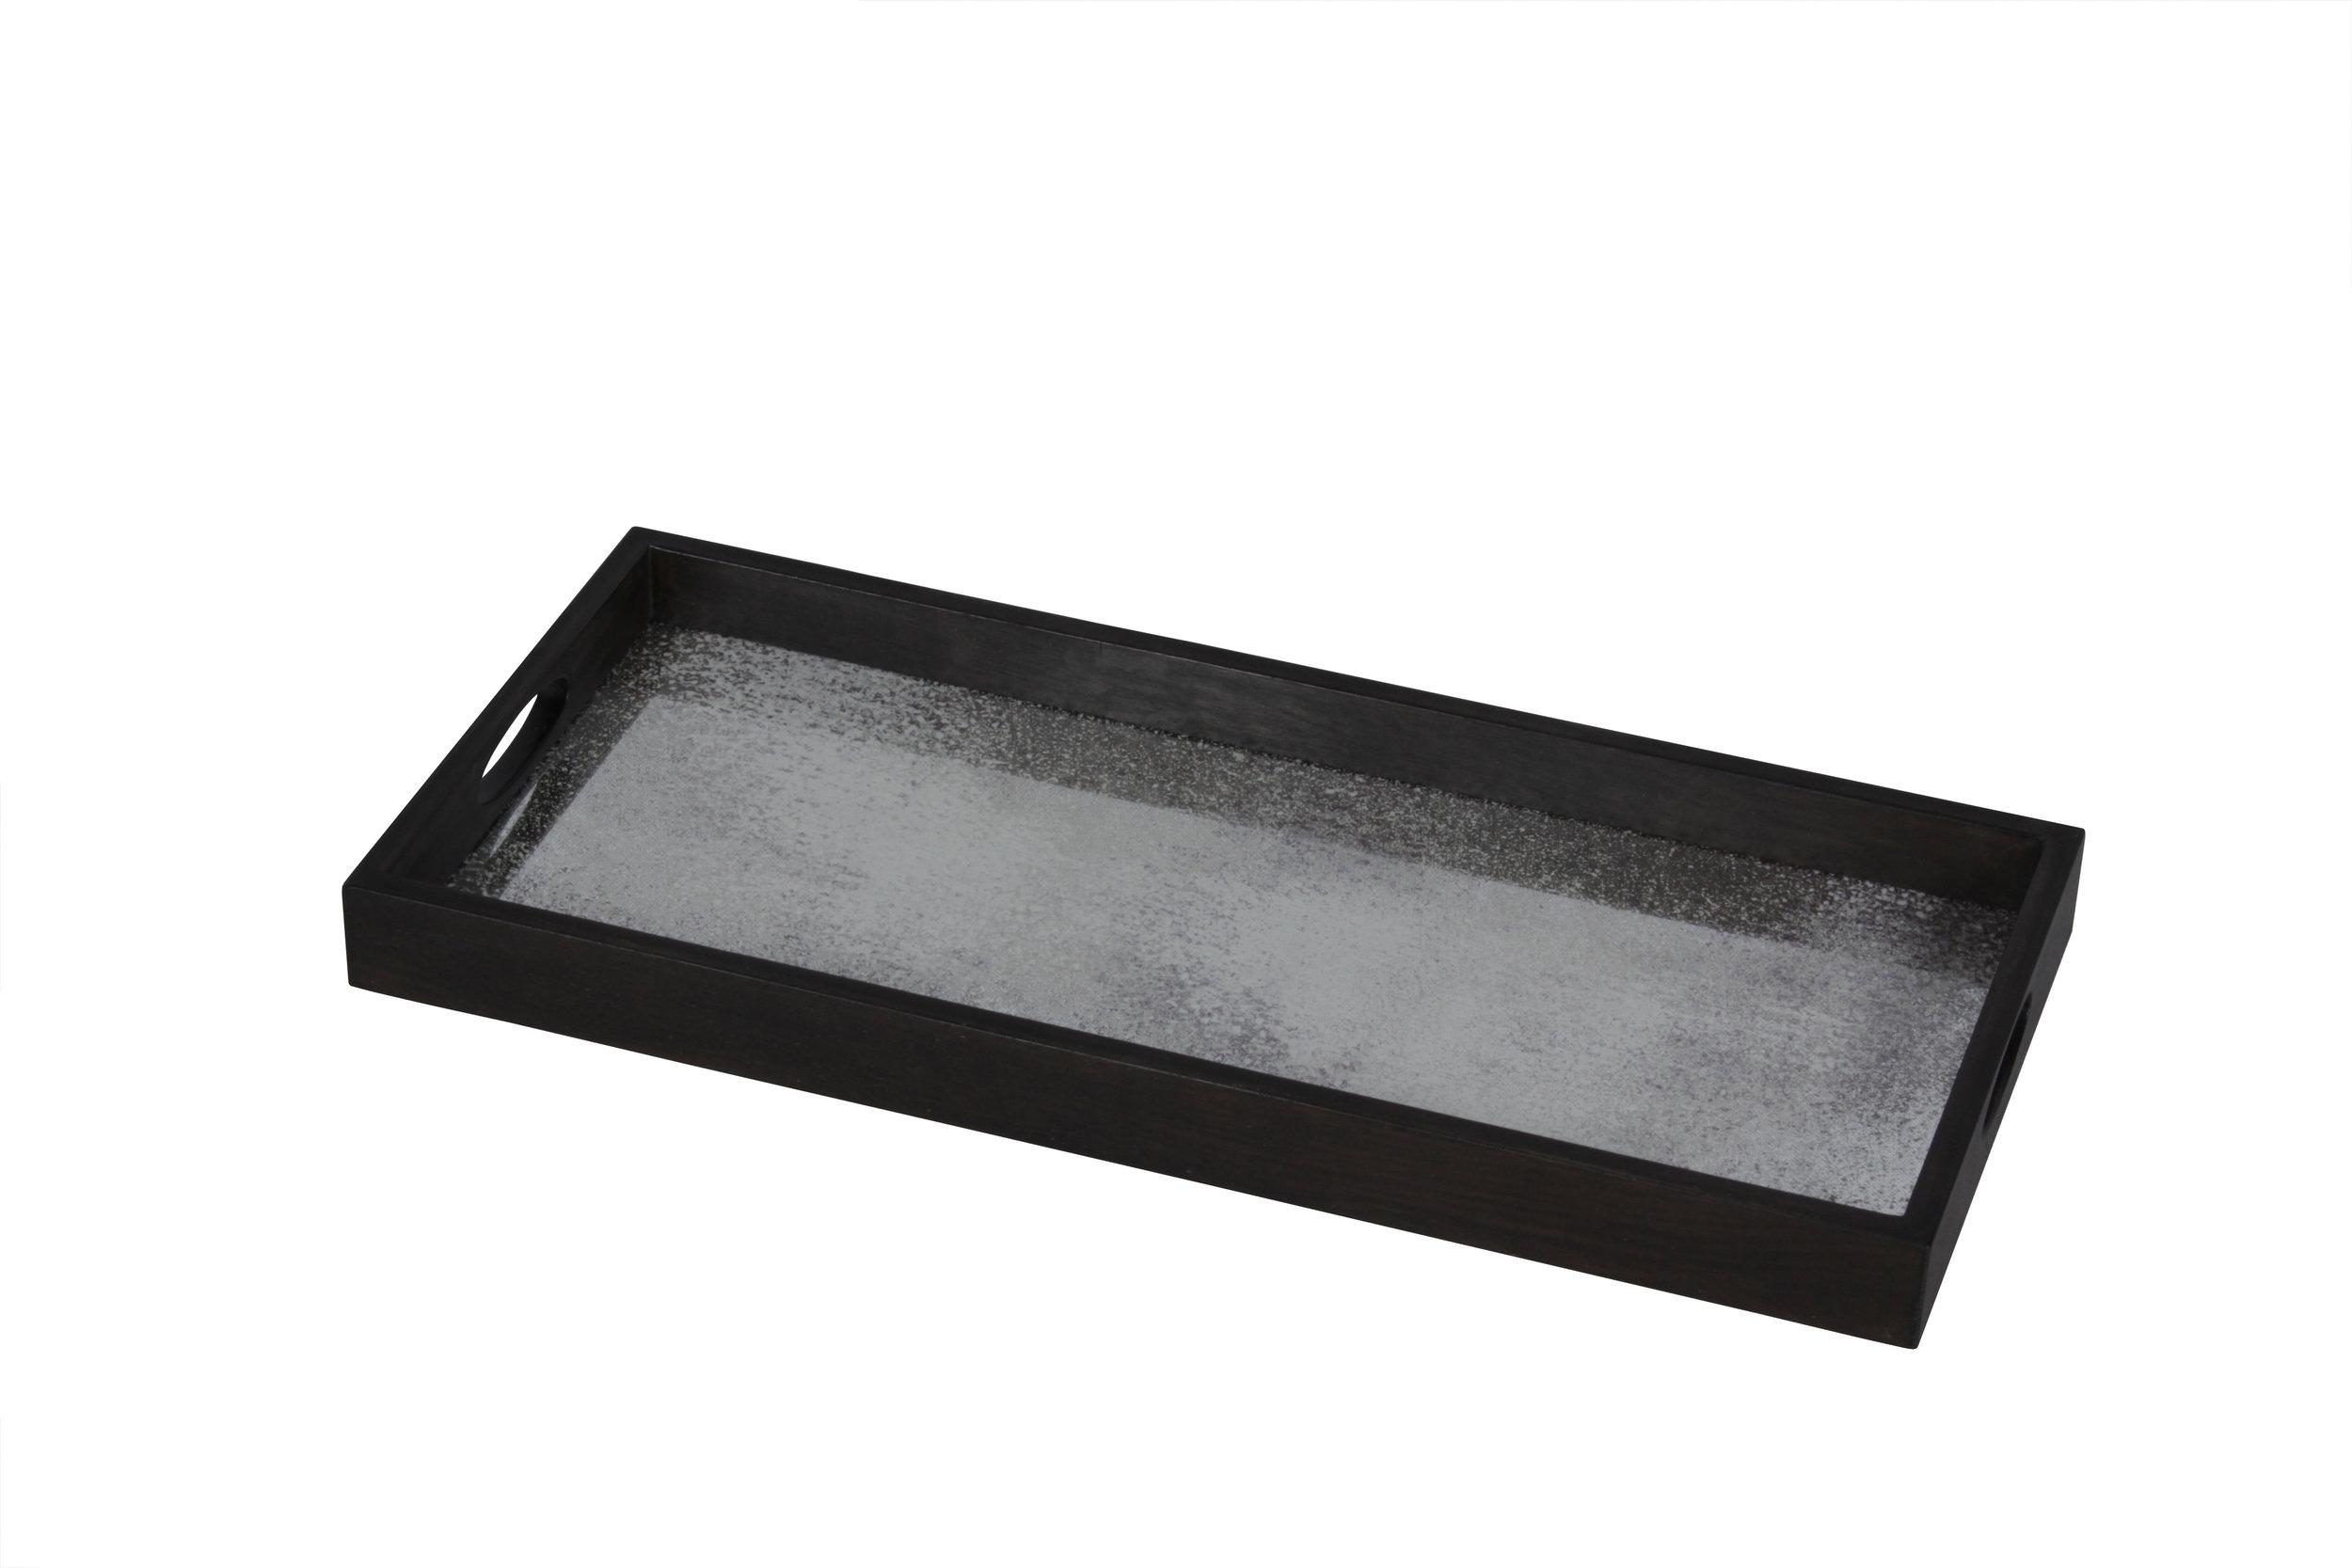 Frost medium mirror tray - £117 - 31 x 69cm